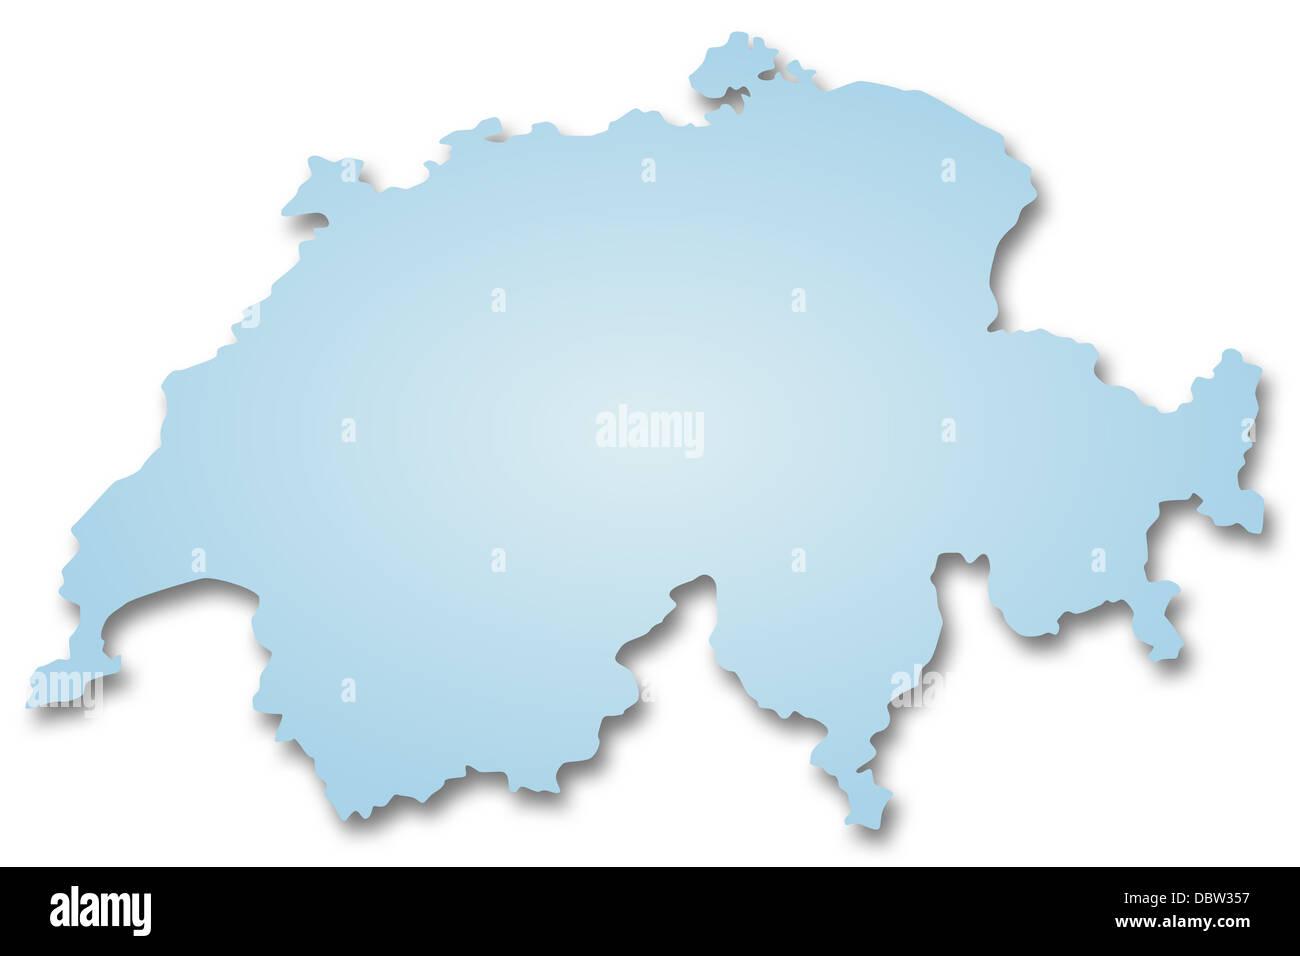 Map of Switzerland - Stock Image